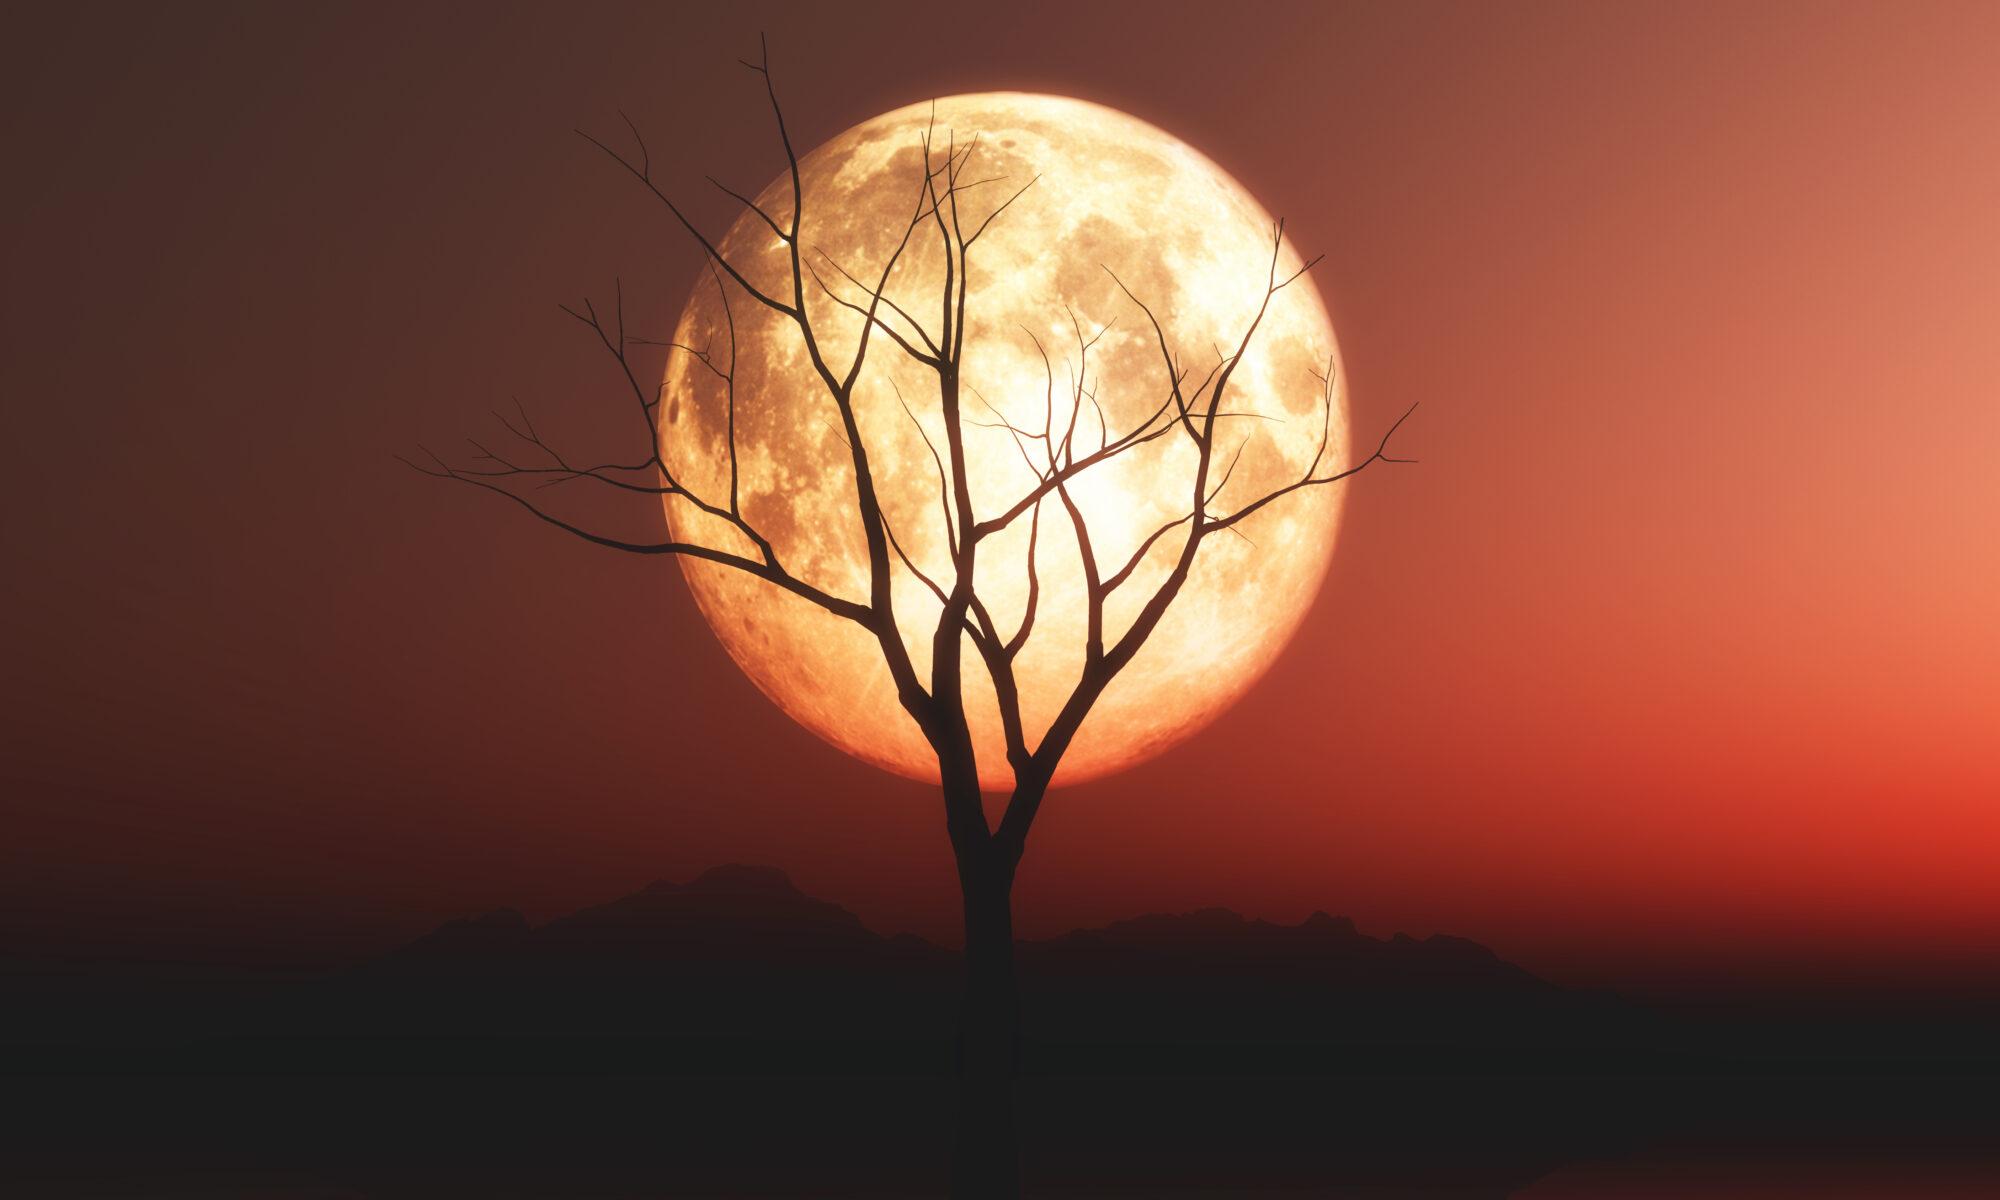 relationship should vibe like moonlight